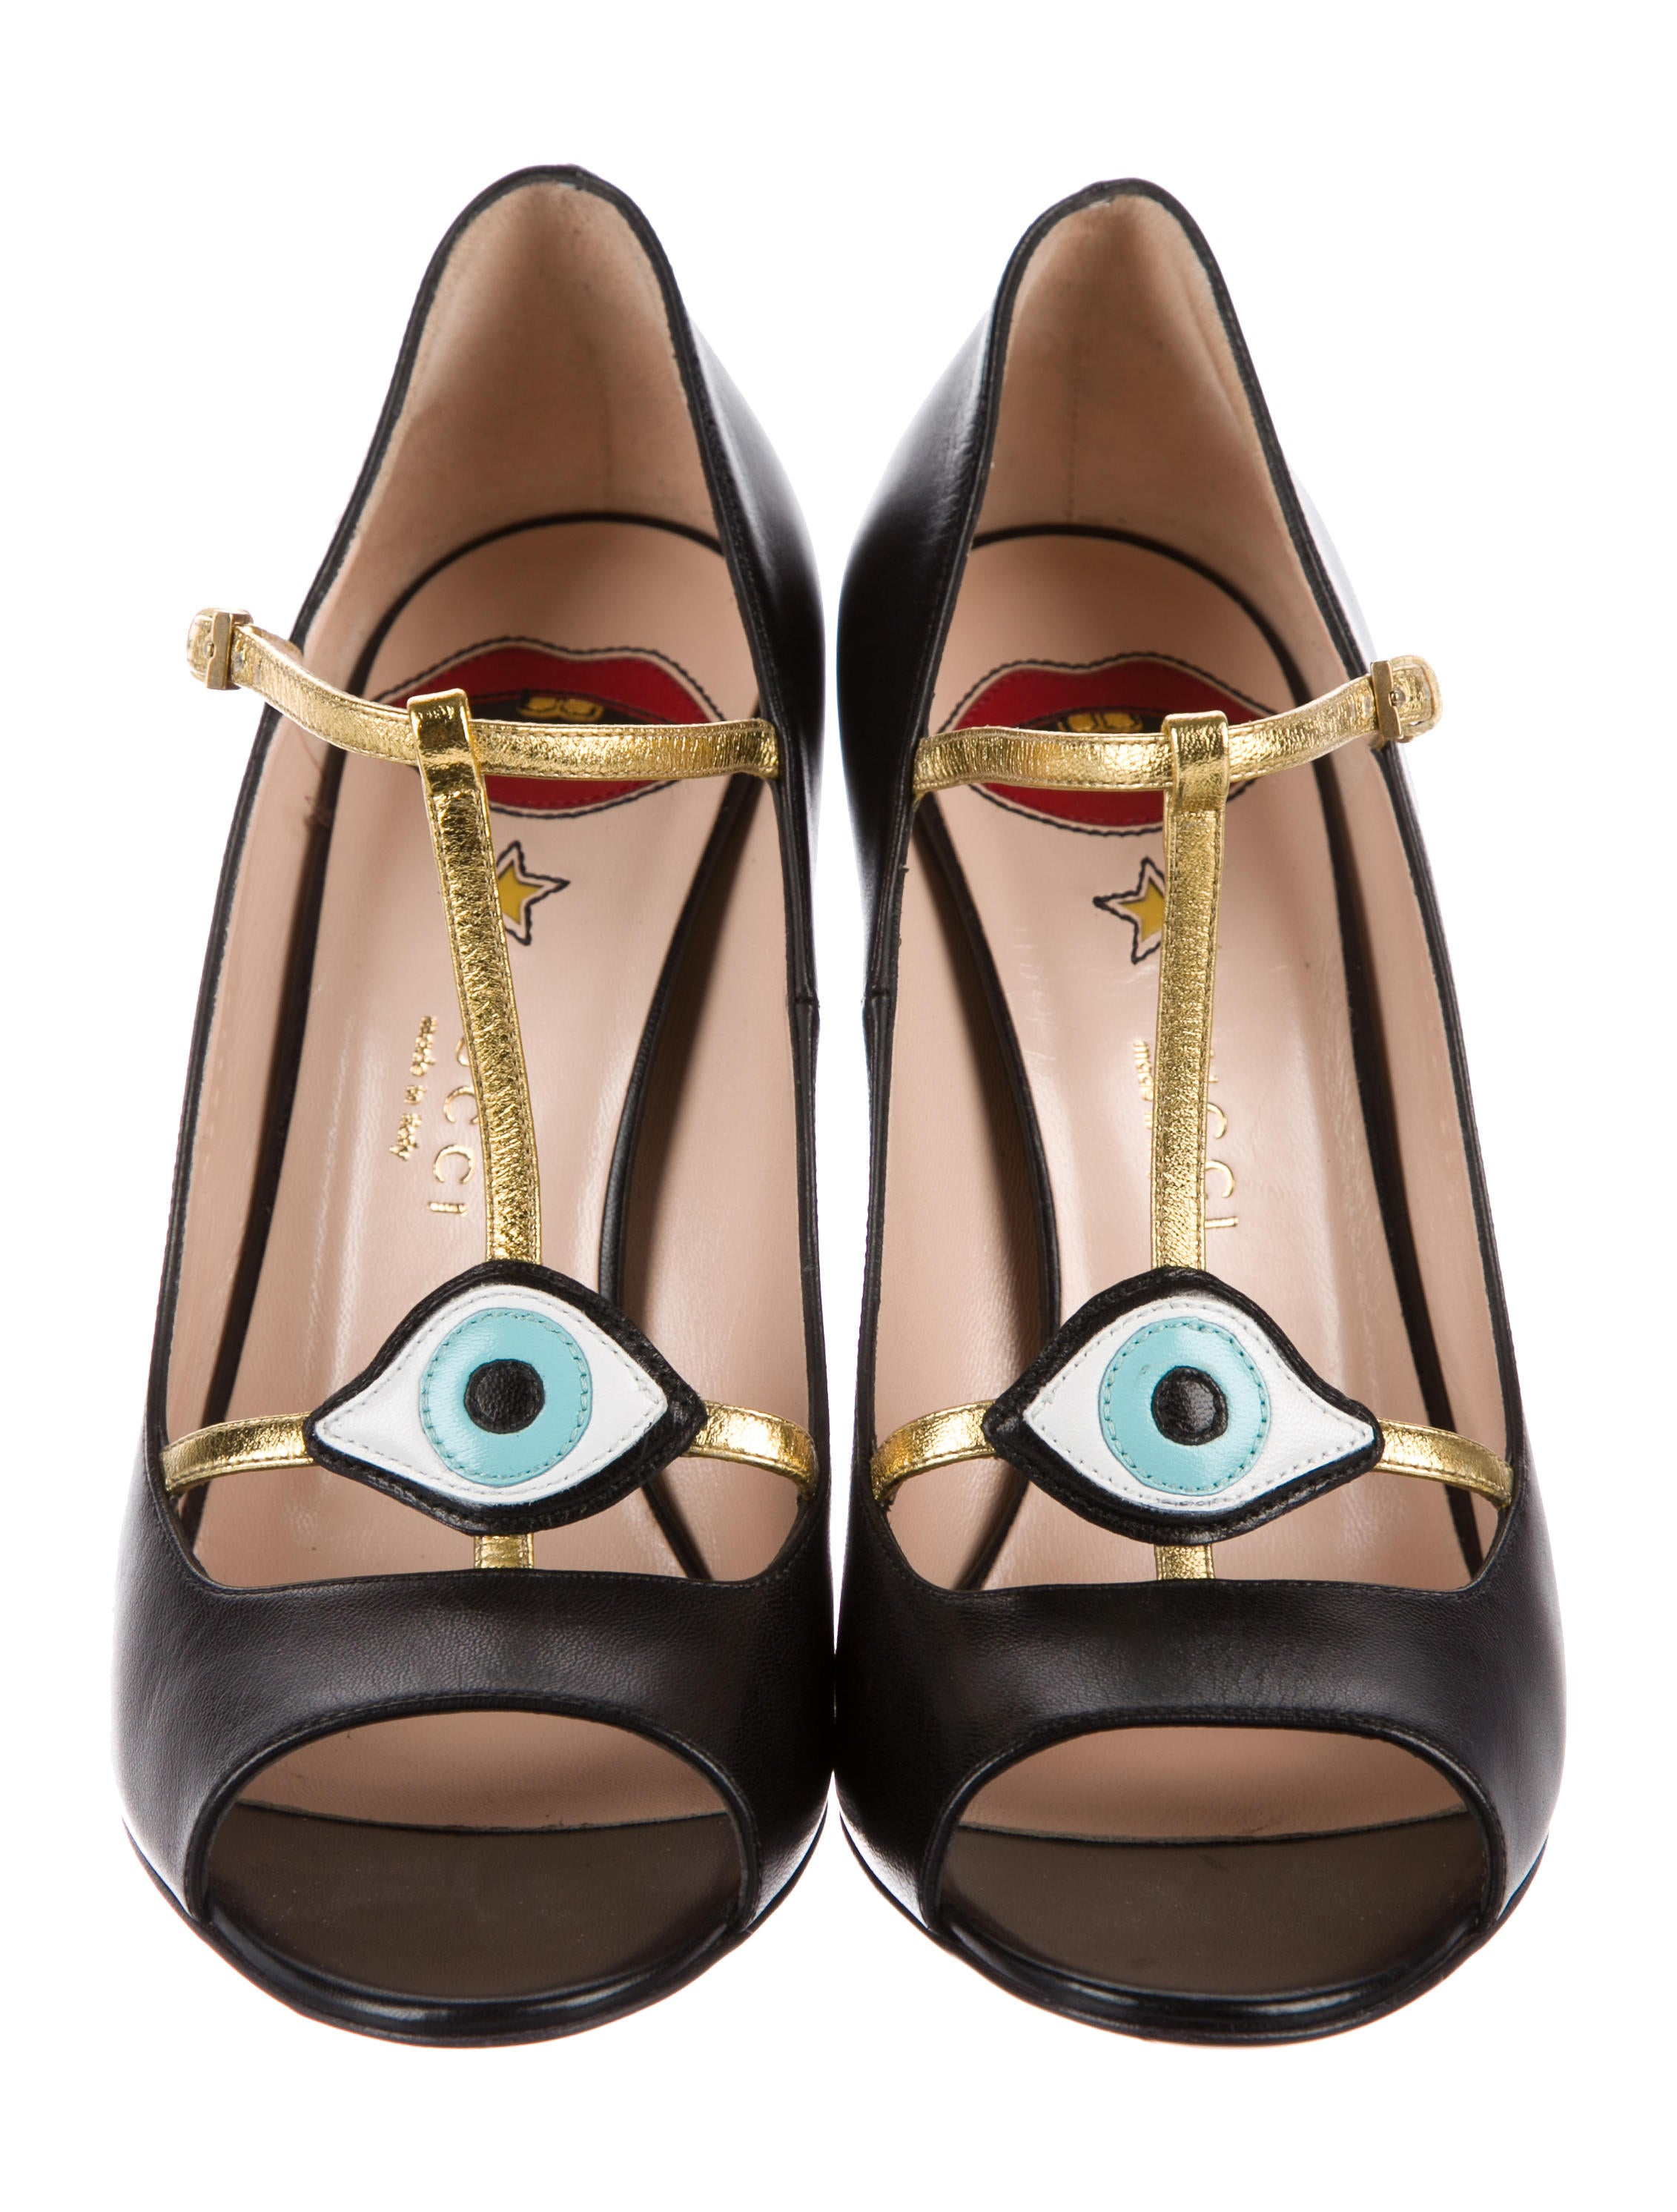 Gucci Shoes Under  Size